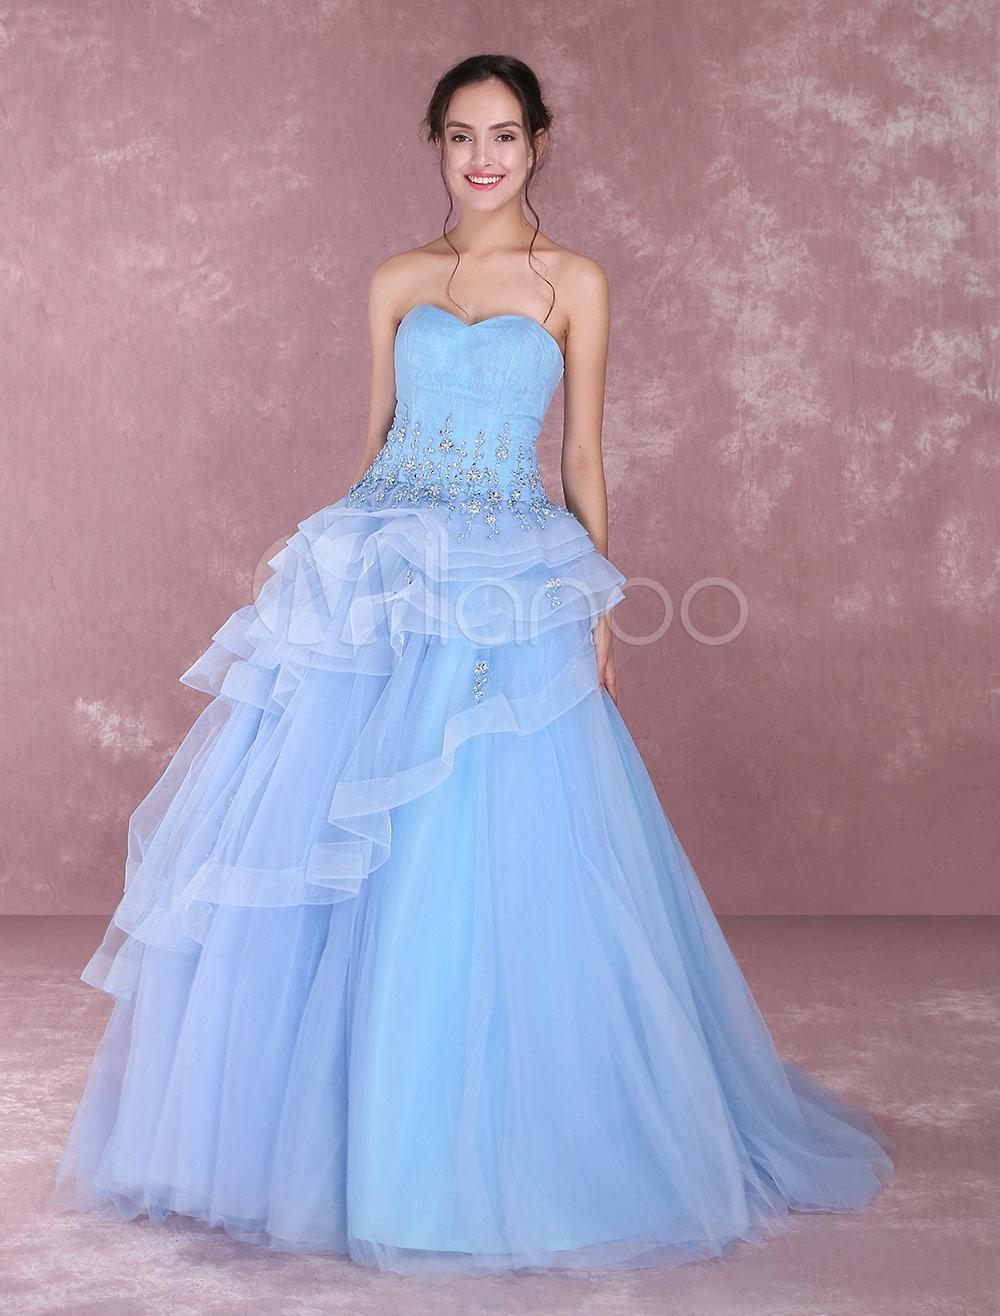 Strapless Baby Dresses